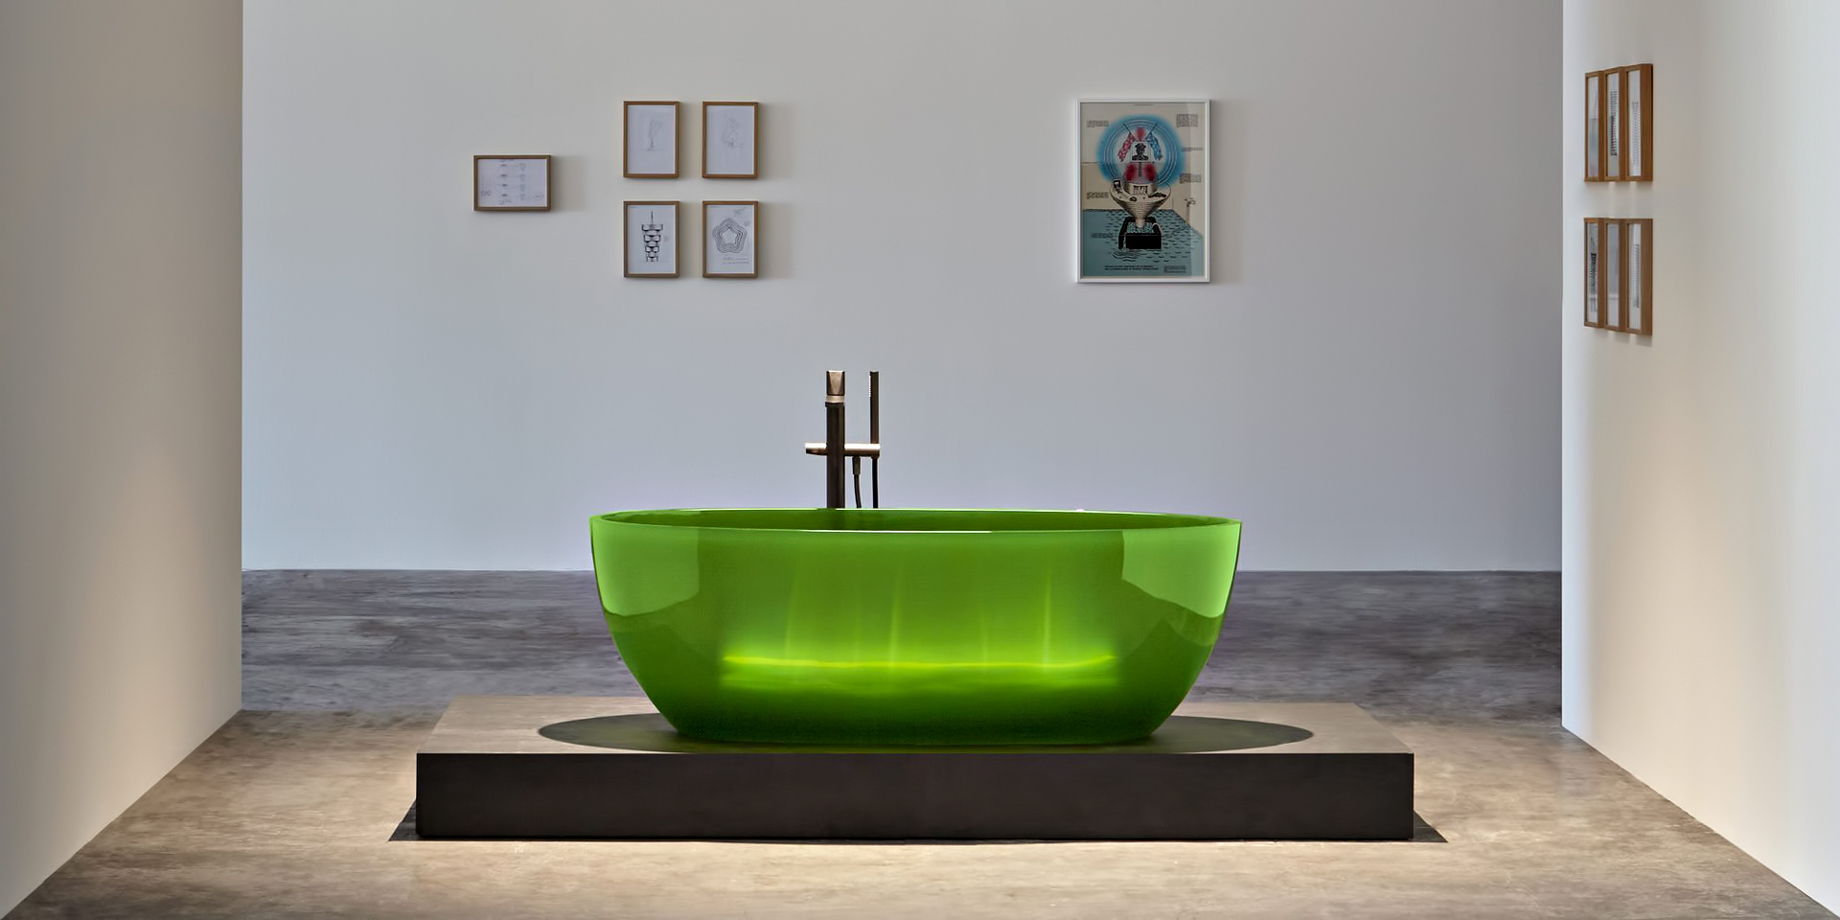 Transparent REFLEX Cristalmood Resin Luxury Bathtub by AL Studio - Lime